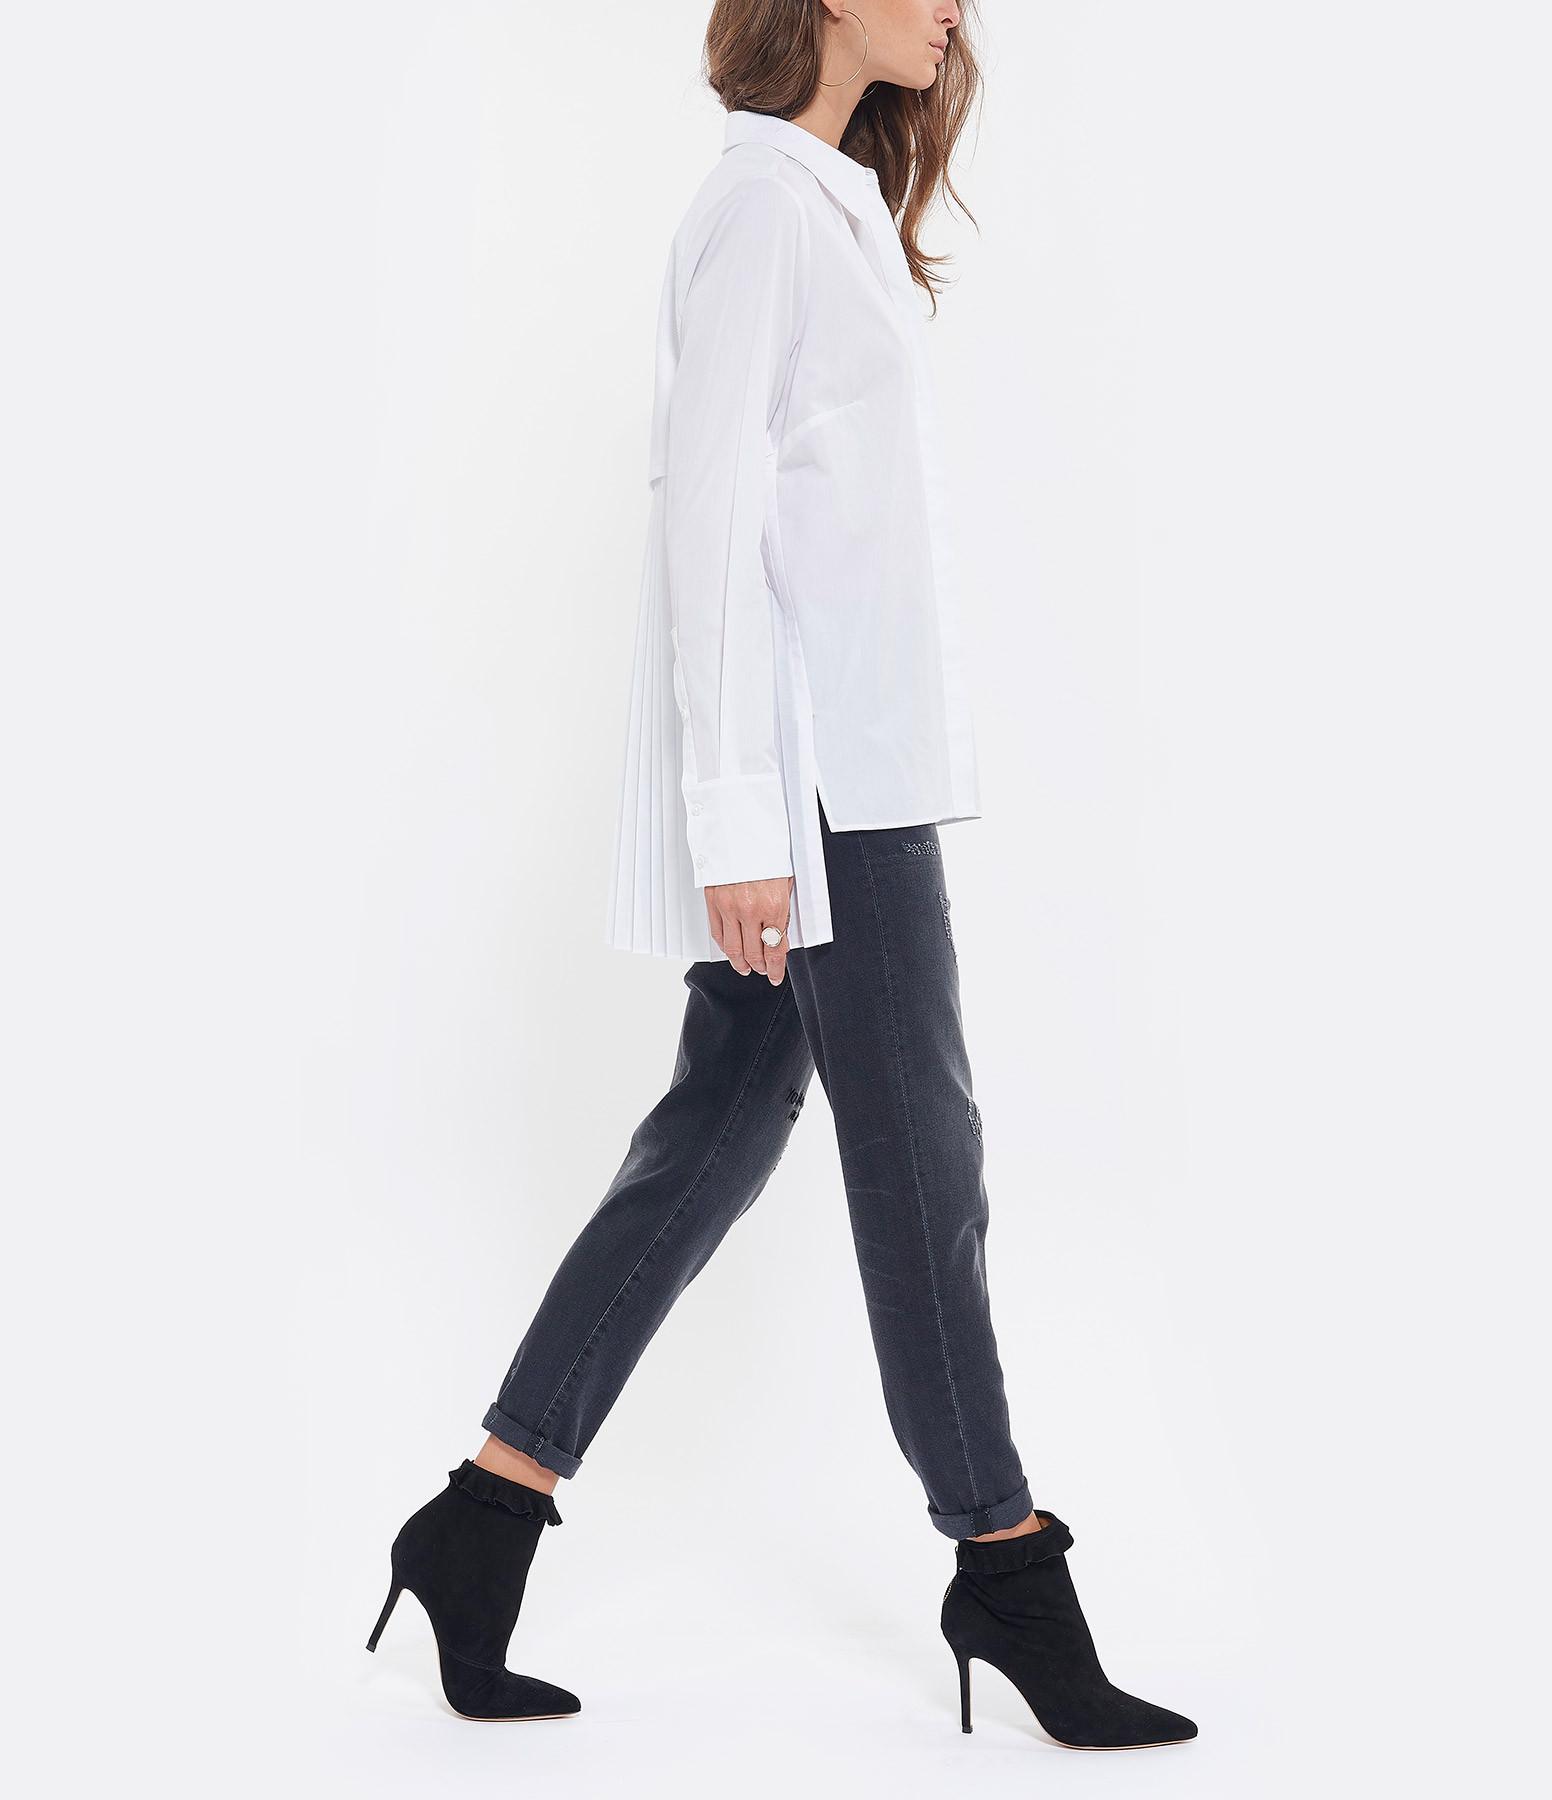 HANA SAN - Chemise Maguro Coton Blanc